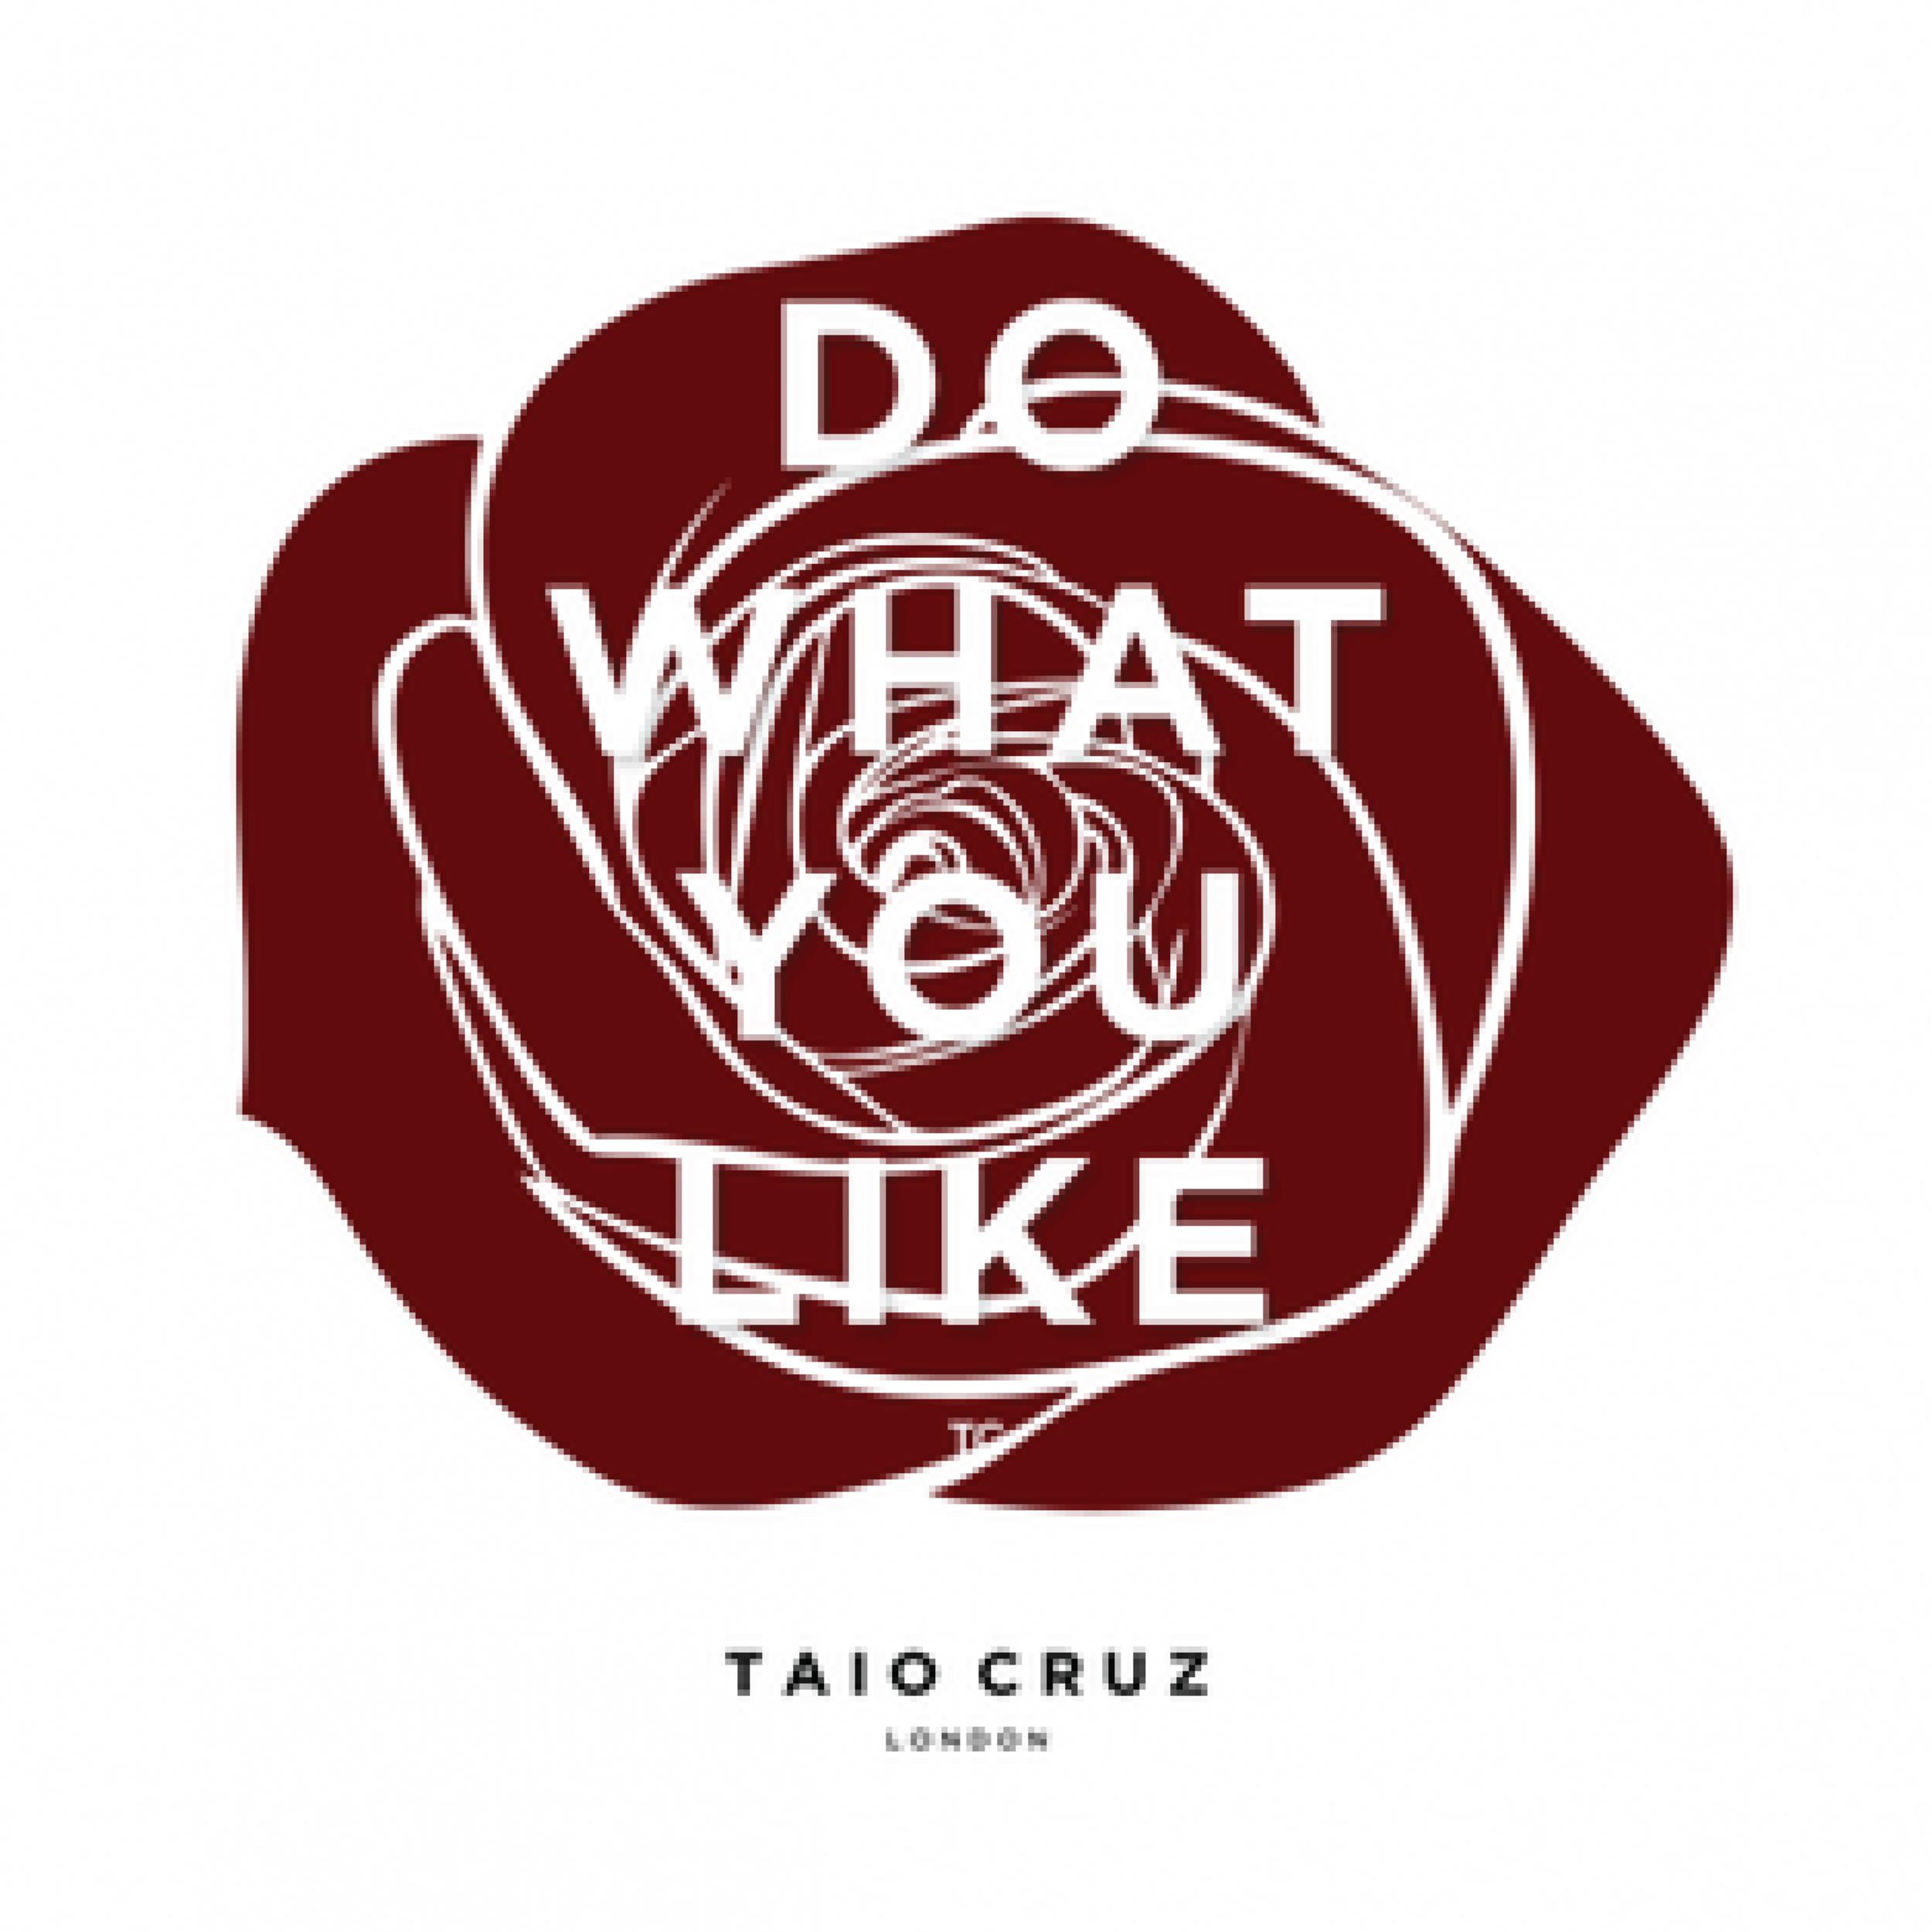 1916 THUMBNAILS_DO WHAT YOU LIKE TAIO CRUZ.png